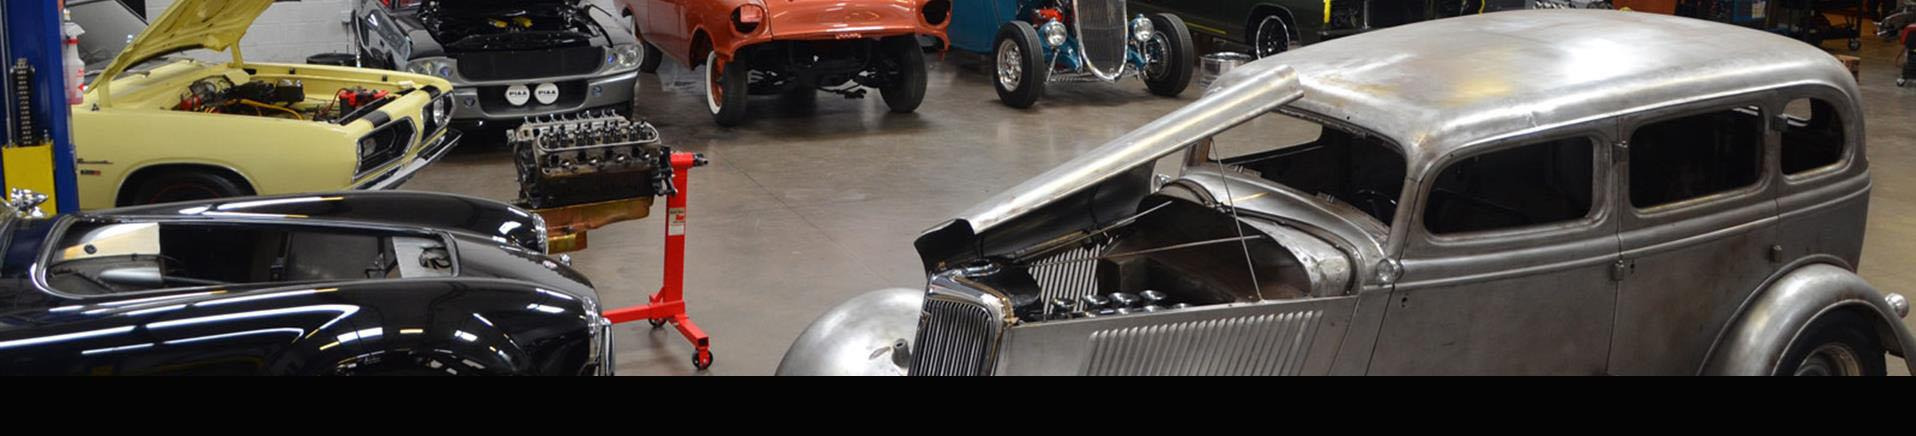 Used Cars Scottsdale AZ   Used Cars & Trucks AZ   Brown\'s Classic Autos